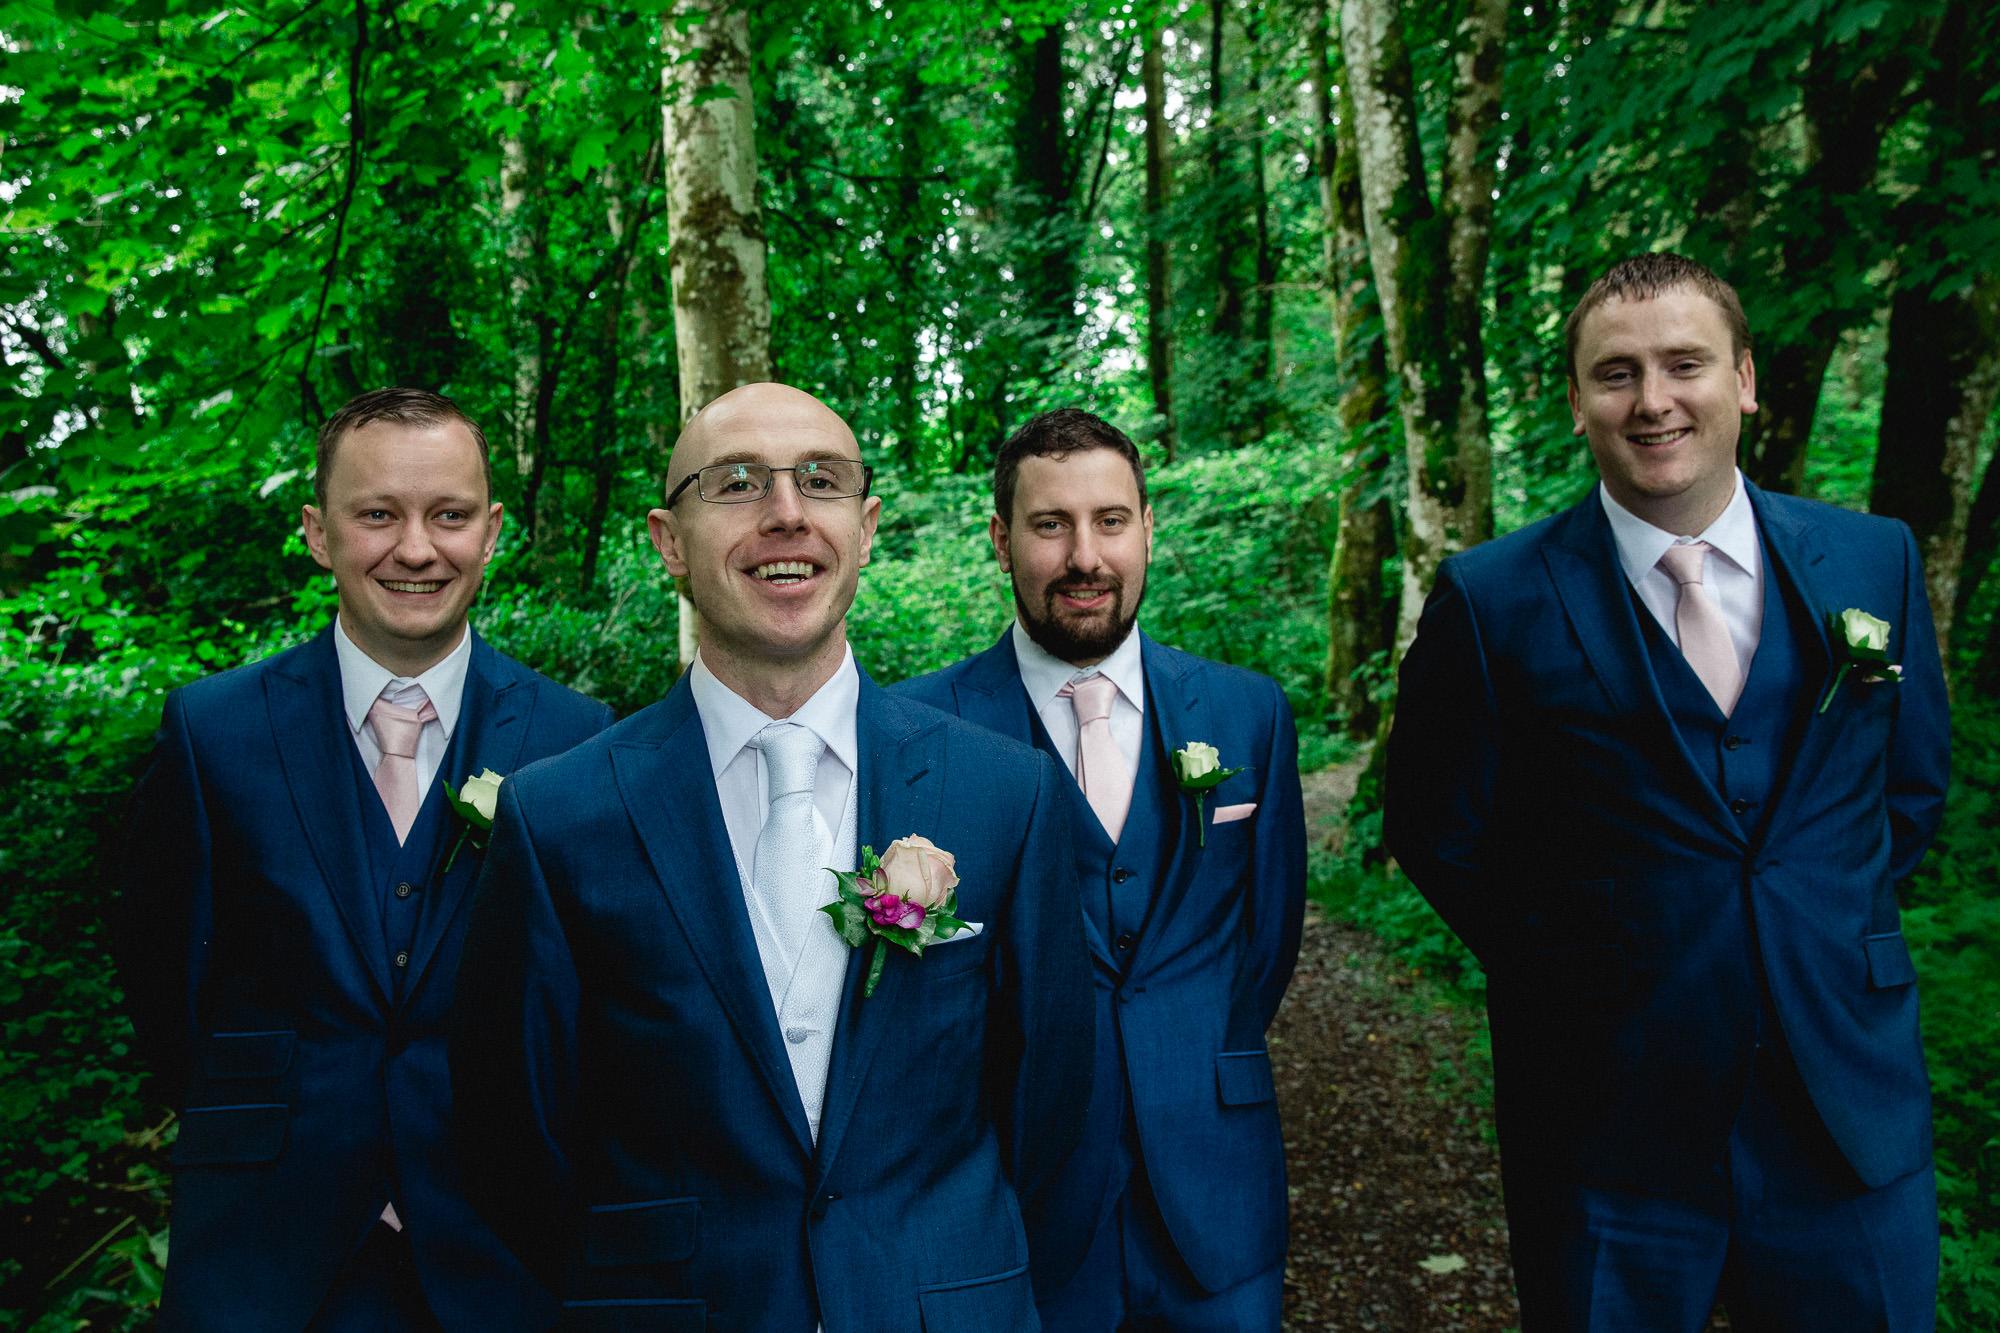 CLAIREBYRNEPHOTOGRAPHY-WEDDING-Ireland-tulffaris-alternative-fun-Lisa-terry-15.jpg